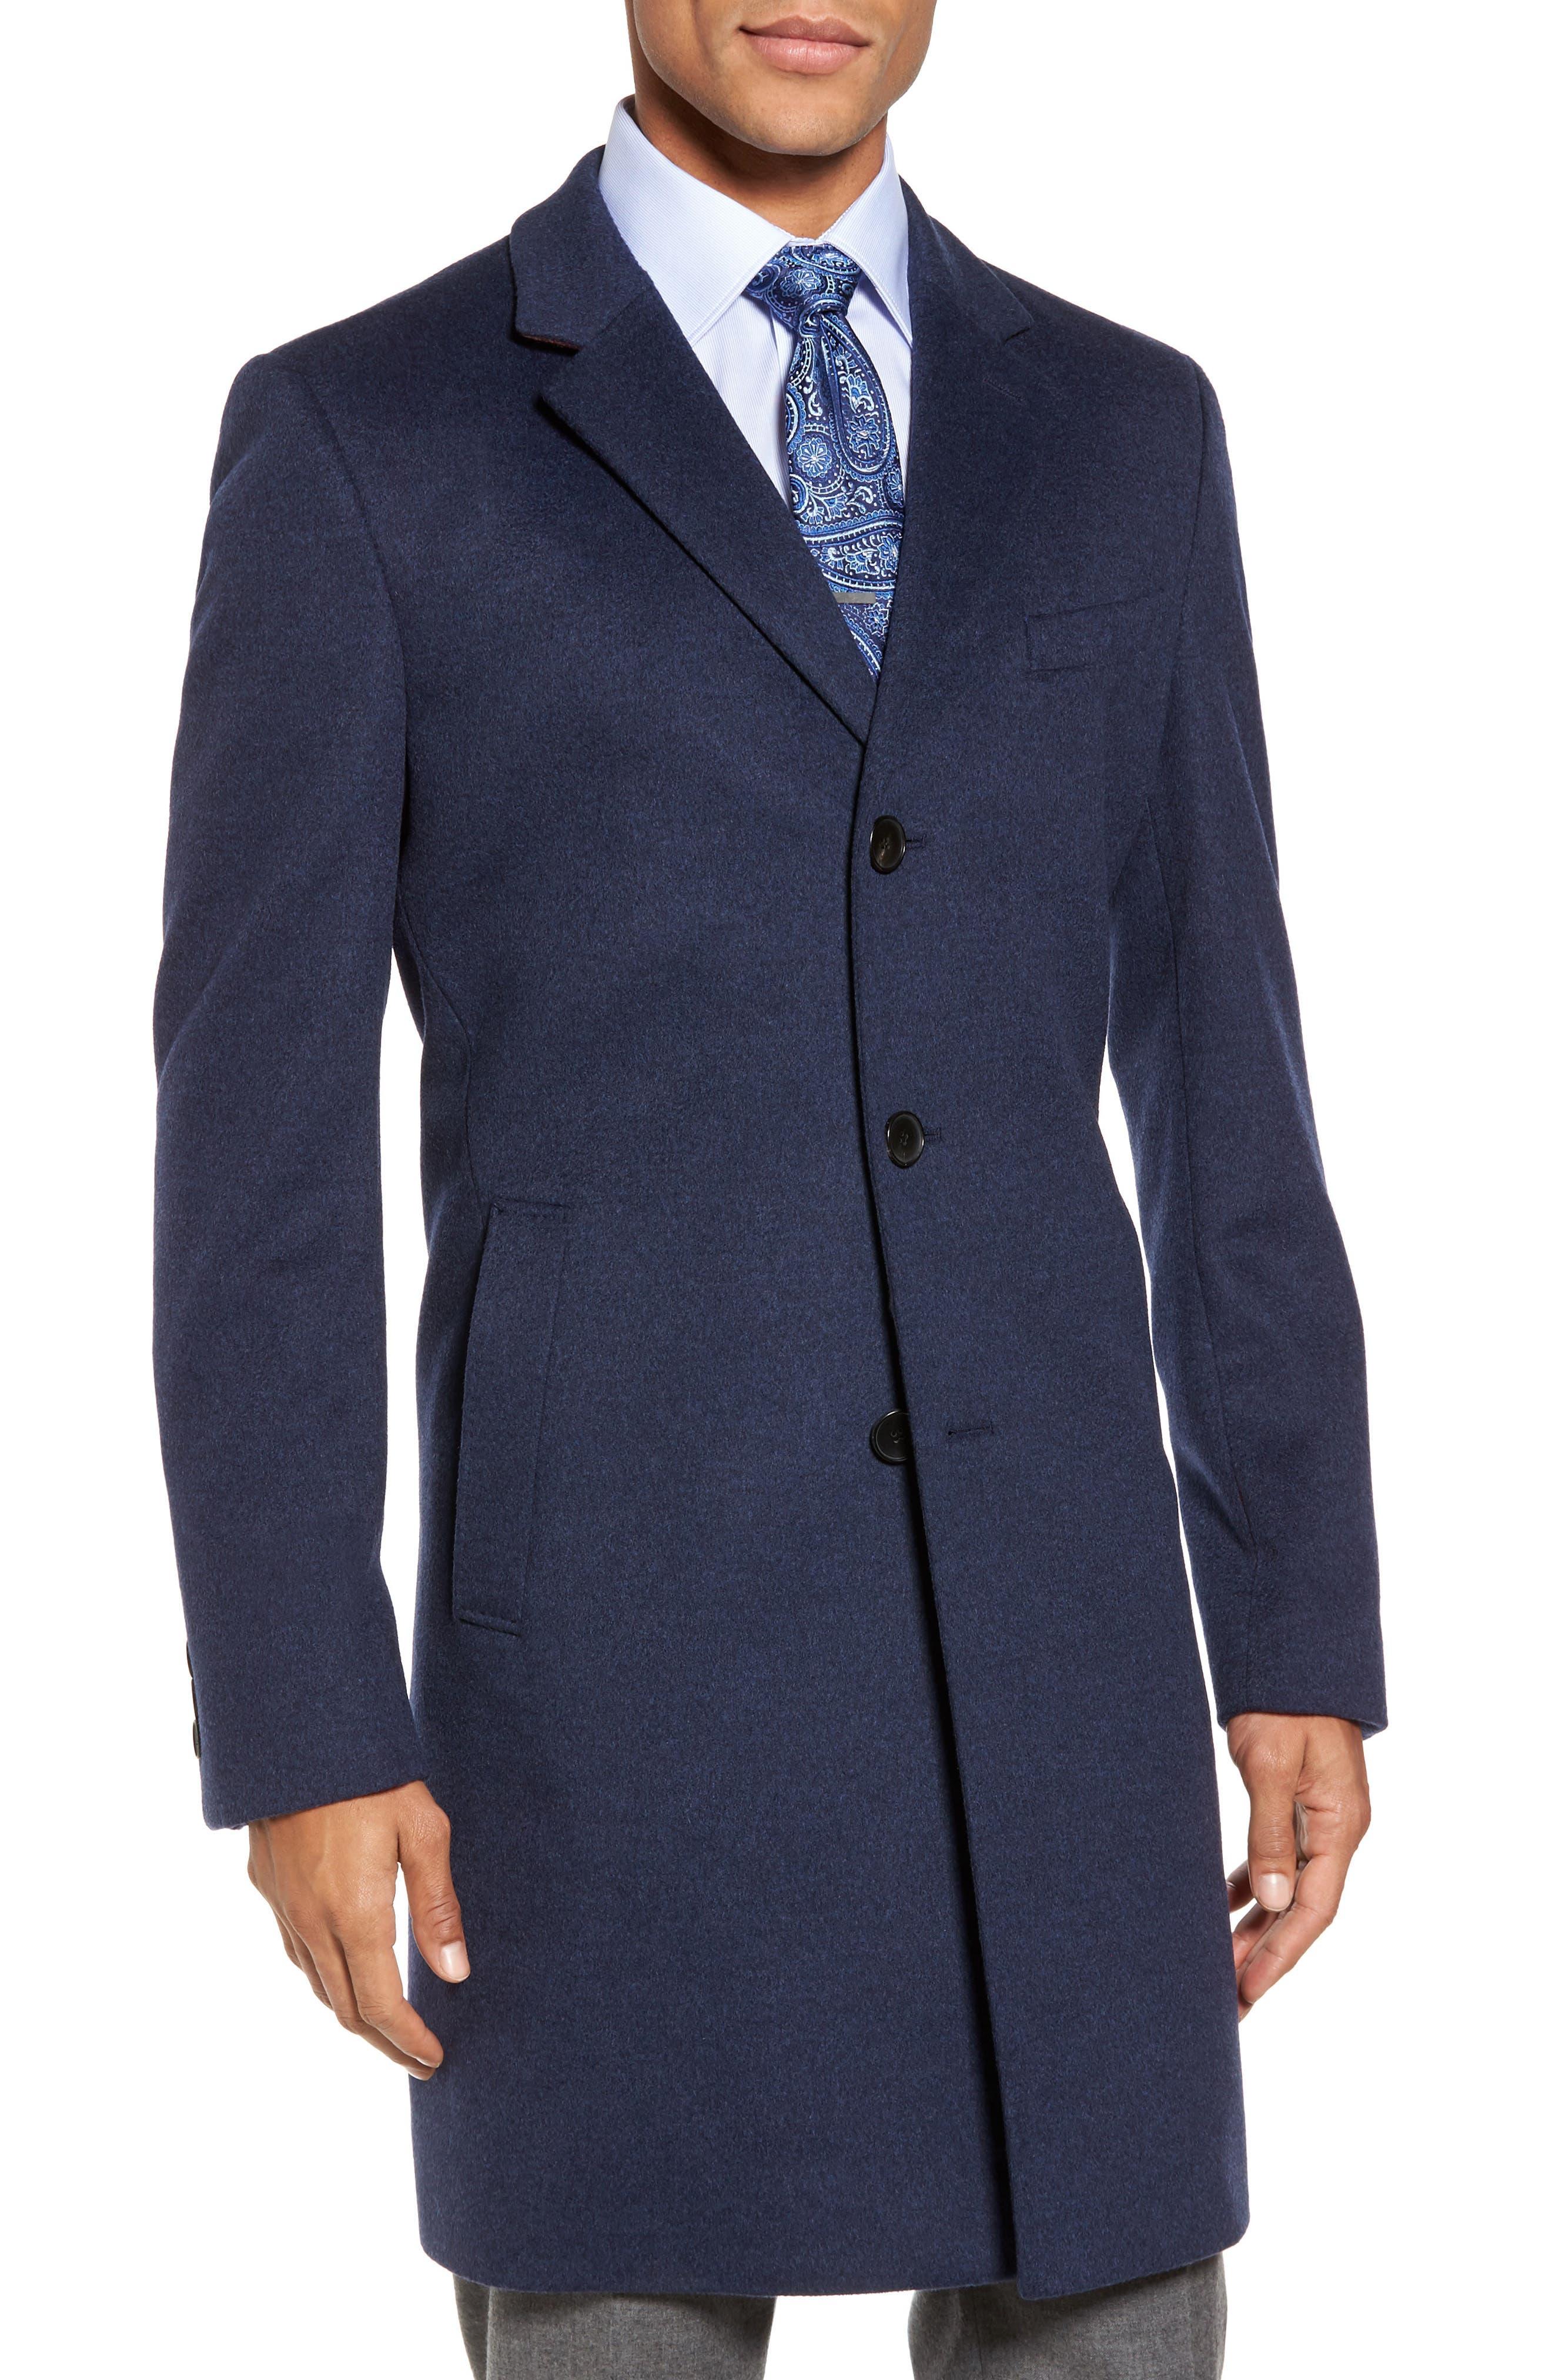 Alternate Image 1 Selected - BOSS Nye Wool & Cashmere Topcoat